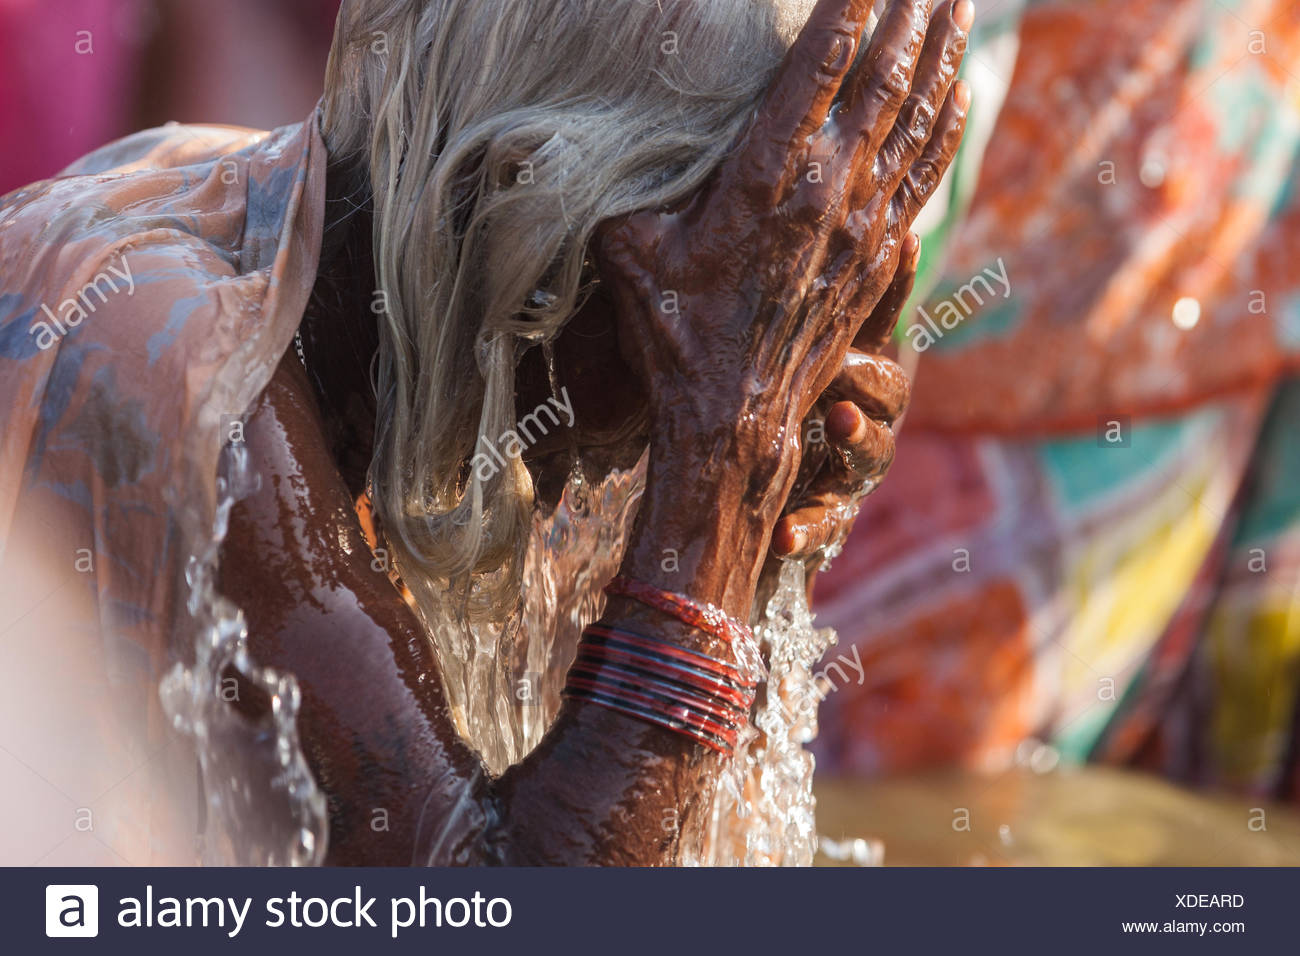 A pilgrim bathe on the most auspicious day of the Kumbh Mela. - Stock Image